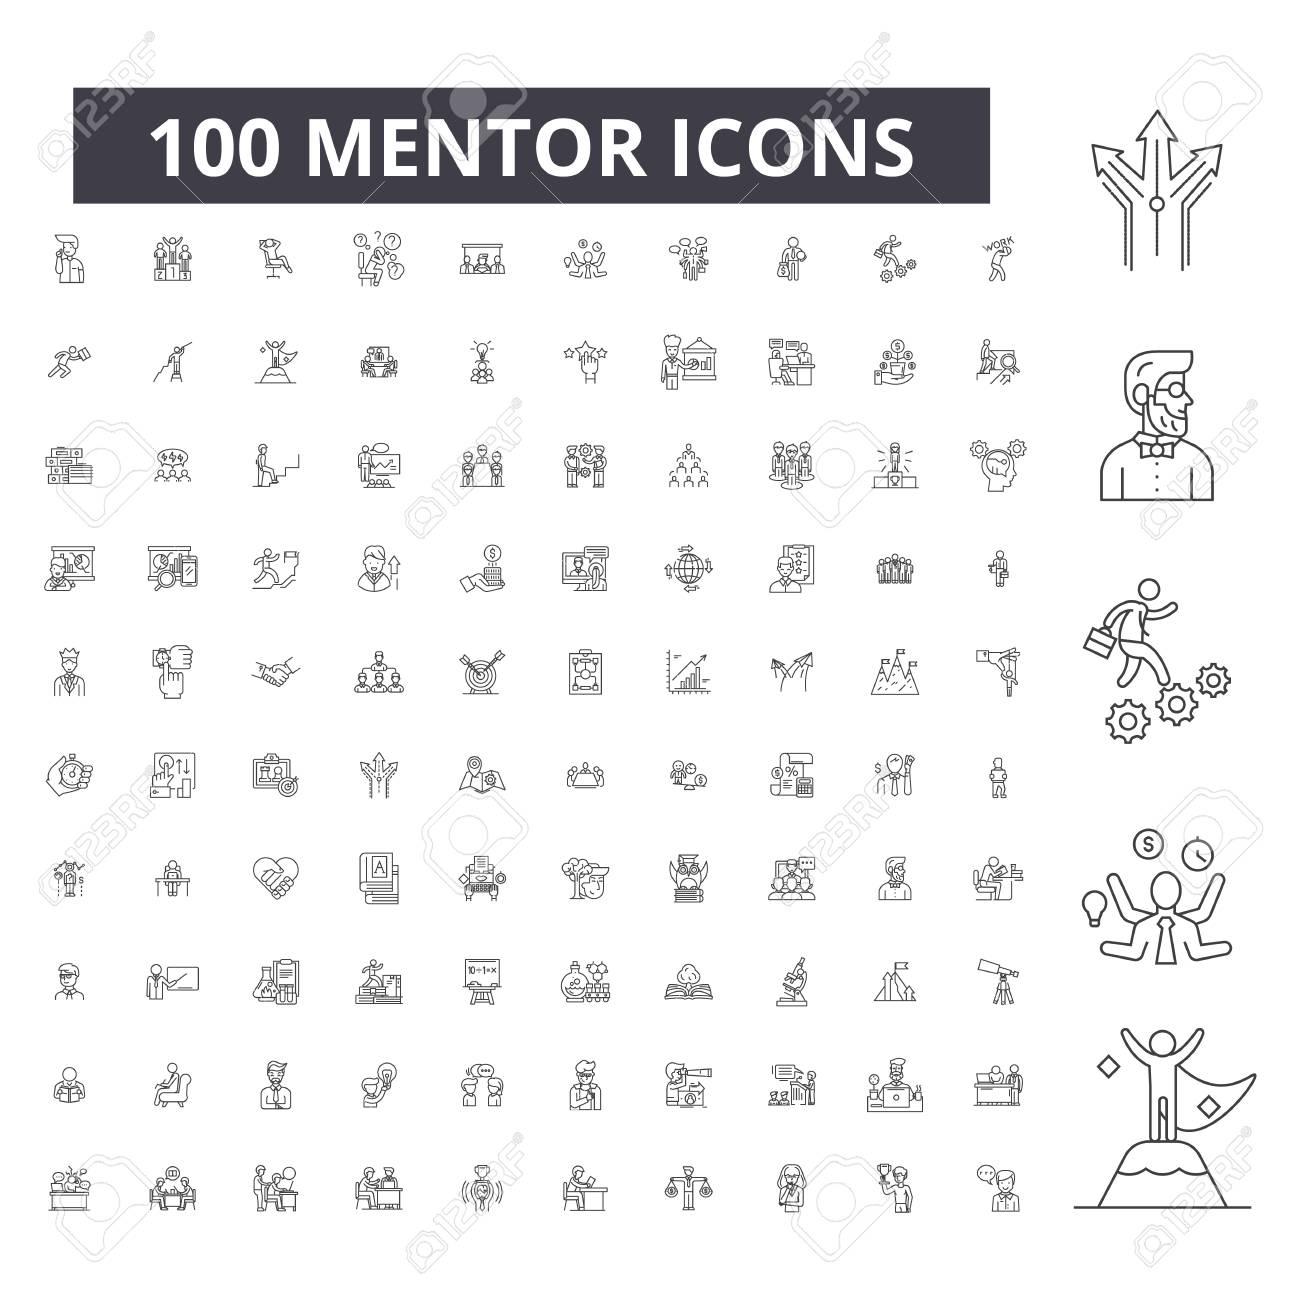 Mentor editable line icons, 100 vector set on white background. Mentor black outline illustrations, signs, symbols - 116431137